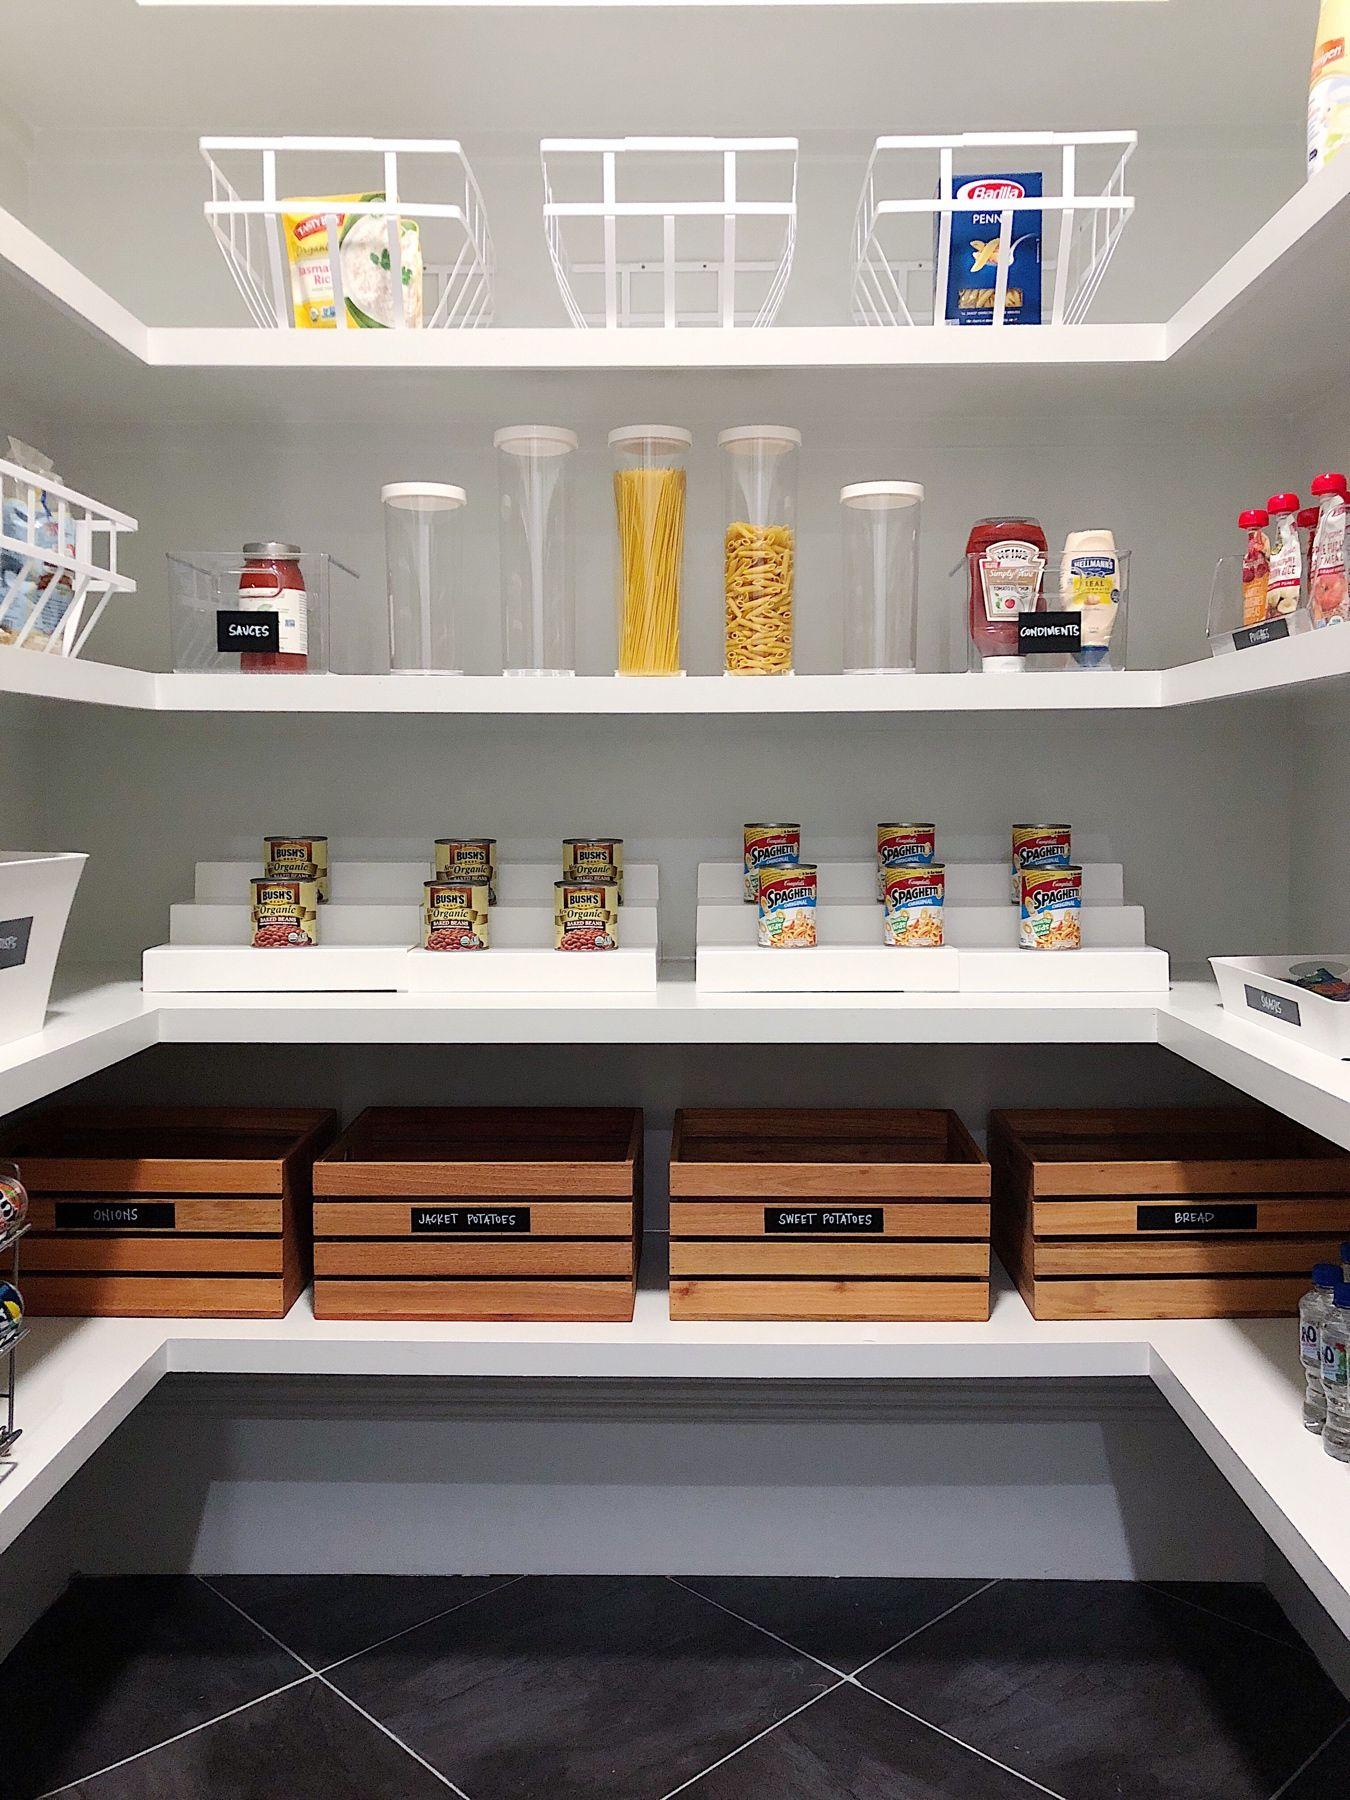 Neat Method Kitchens Kitchen Design Kitchen Inspiration Pantry Ideas Kitchen Storage Kitchen Cabinets Home Organization Dining Room Office Luxury Homes